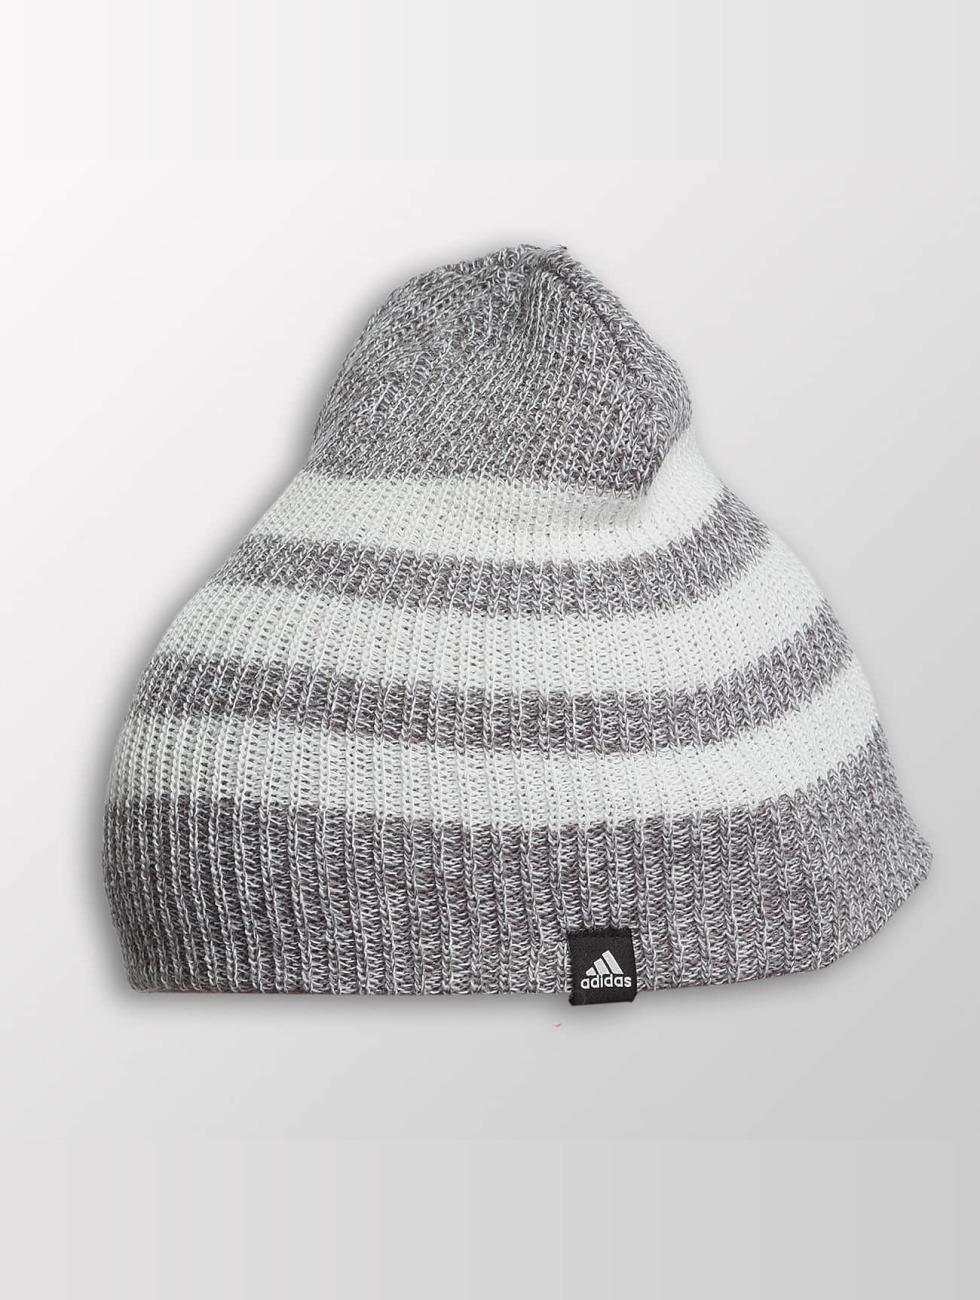 adidas originals Hat-1 Adidas 3S gray